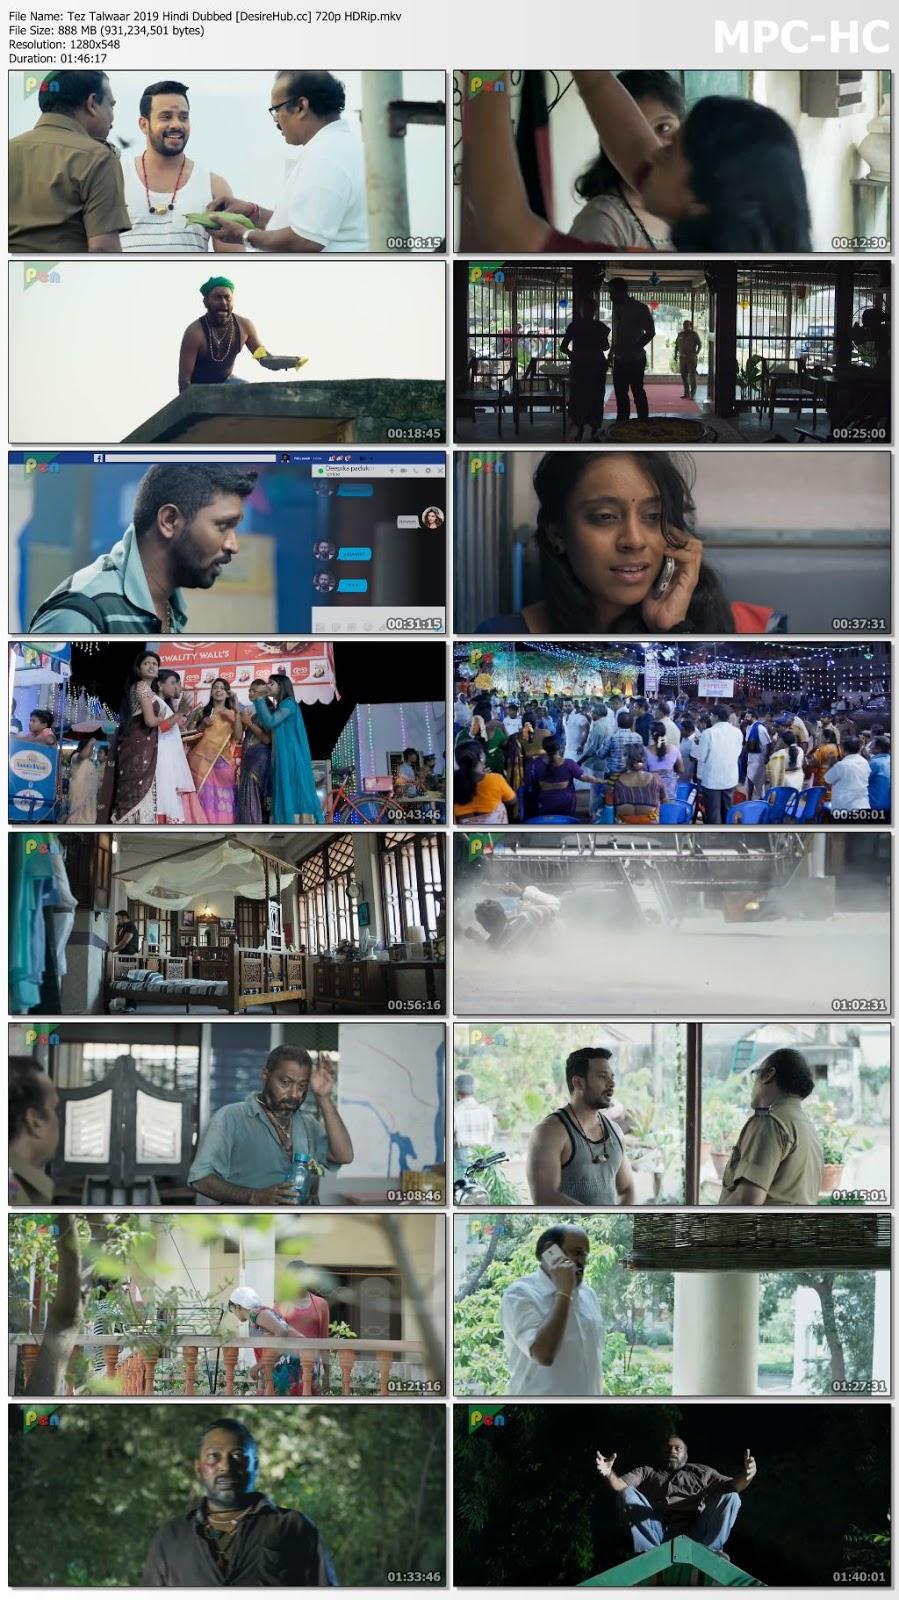 Tez Talwaar 2019 Hindi Dubbed 720p HDRip 850mb Desirehub